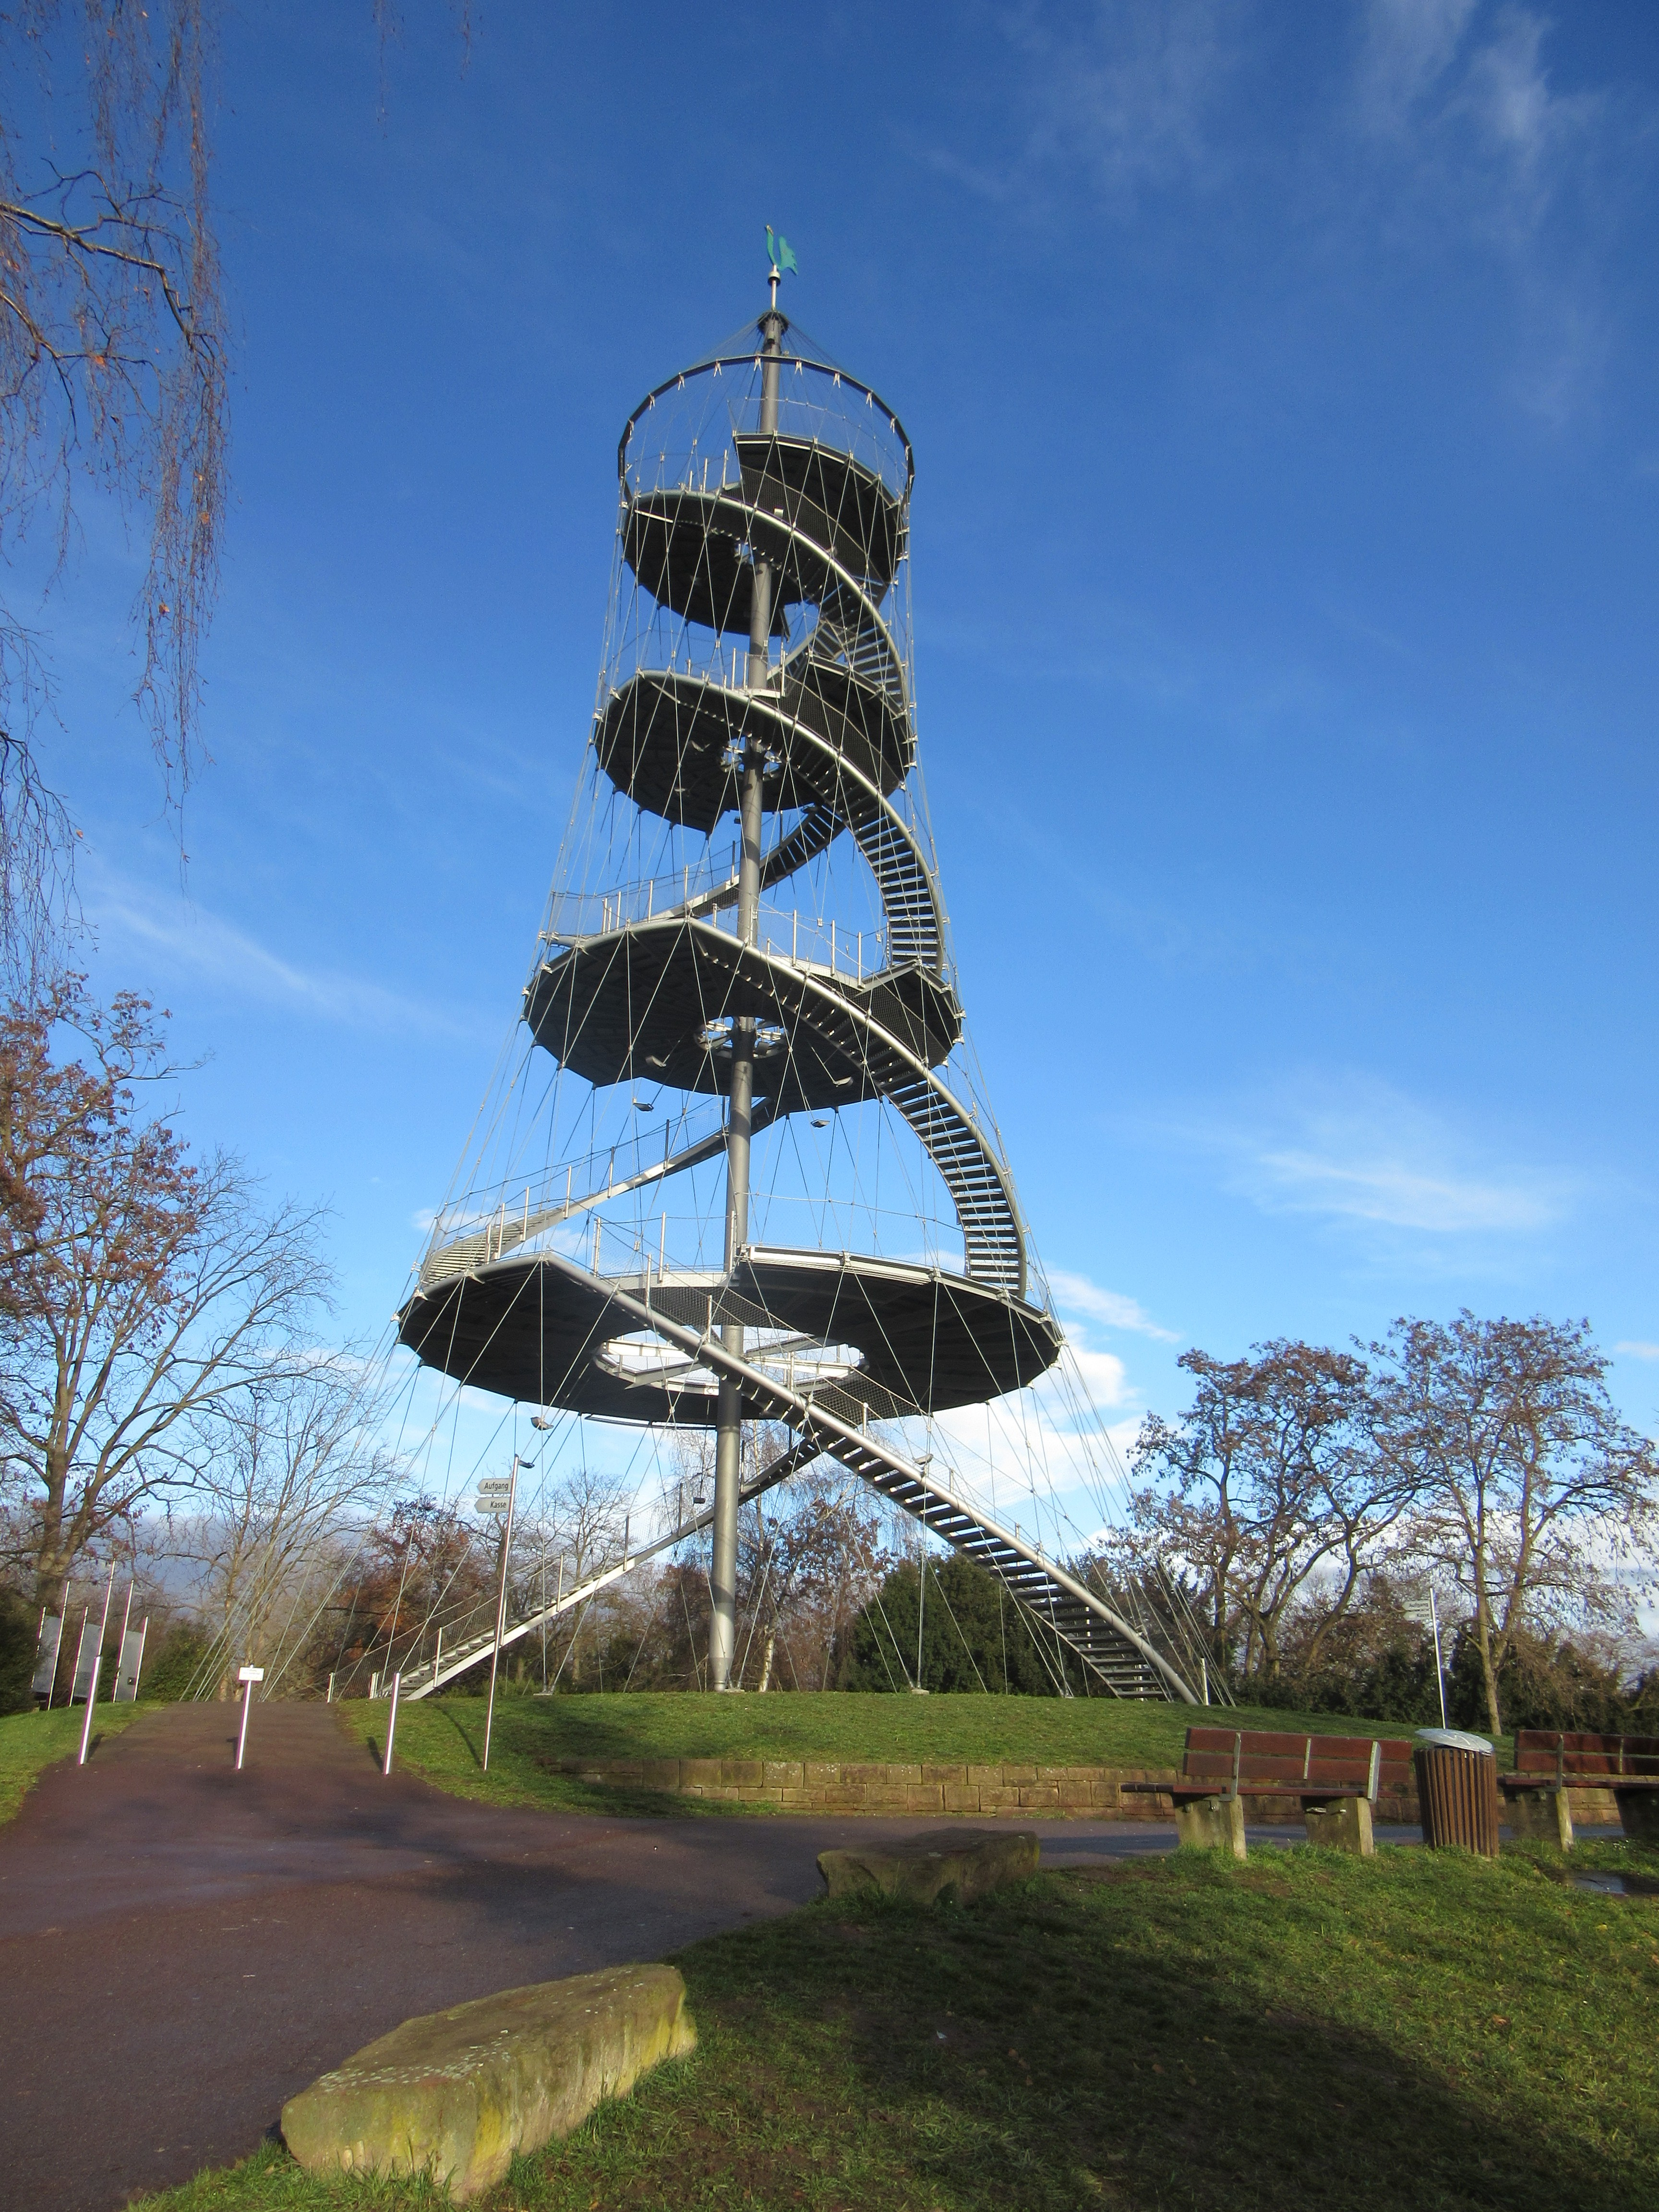 The tower in Killesberg Park.